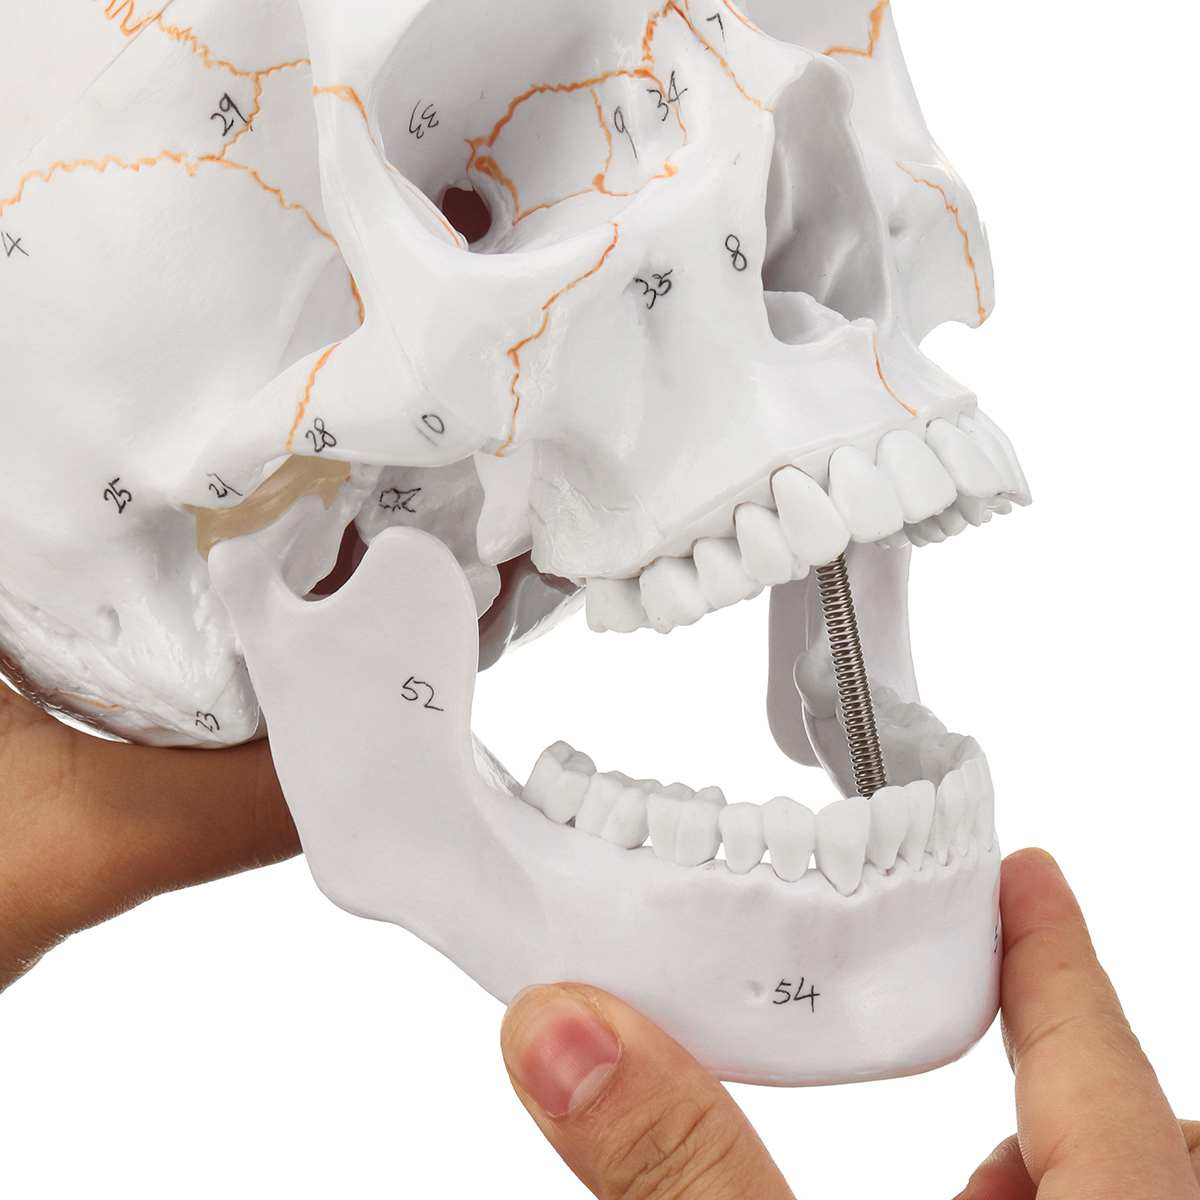 Head Skeleton Skull 1:1 Model Medical Science Teaching Life size Skull for School Human Anatomy Precise Adult Head Medical Model